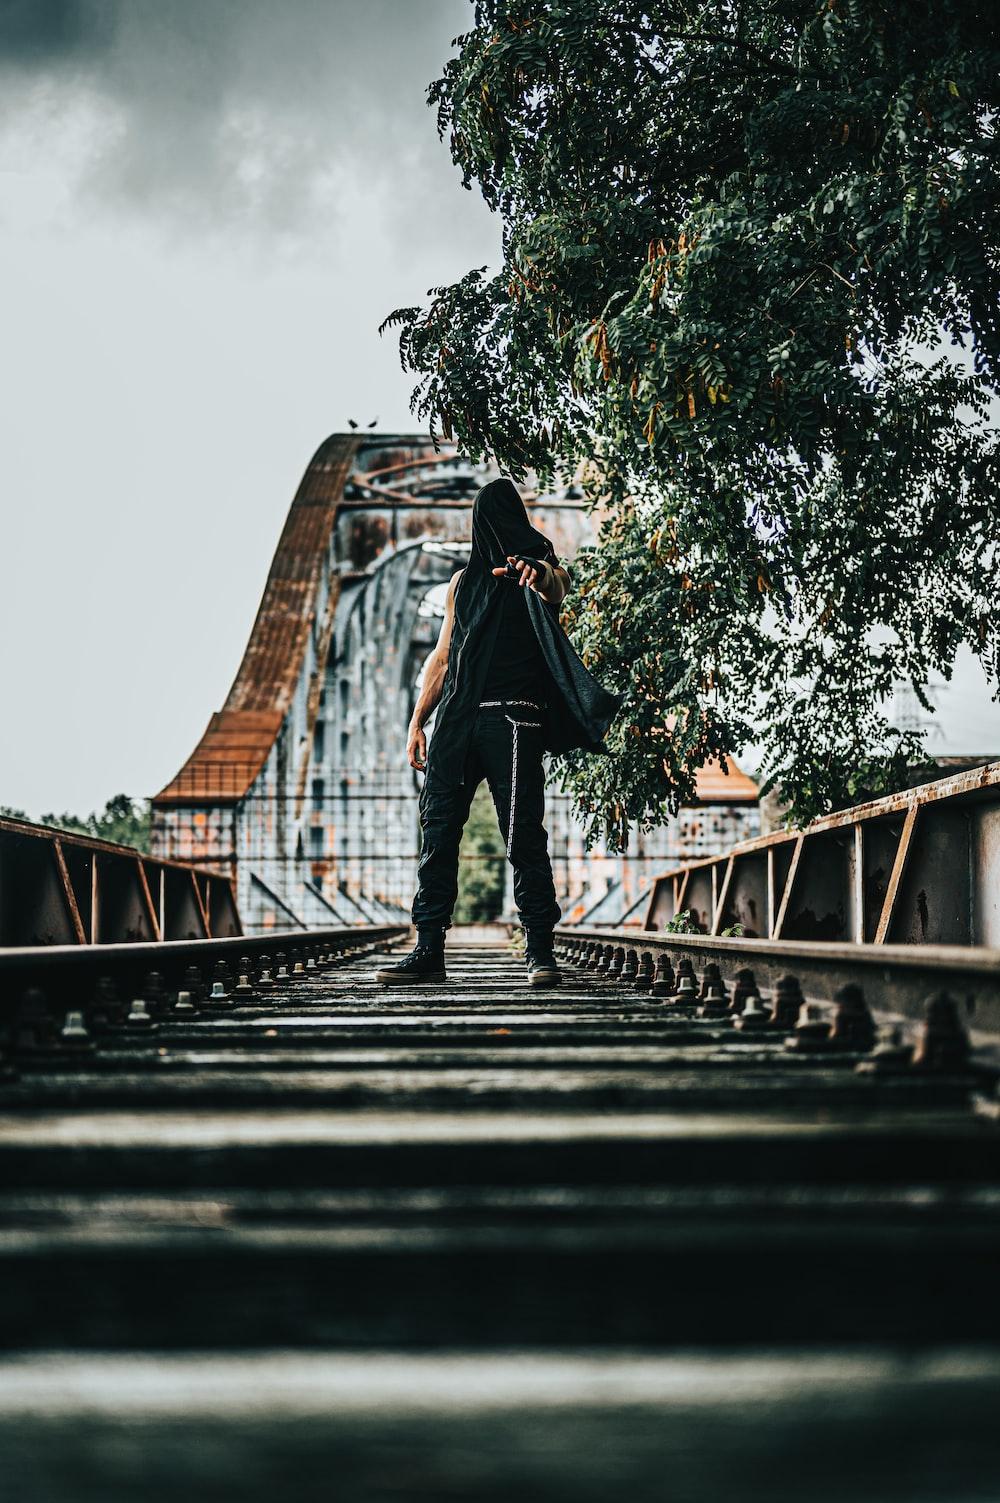 woman in black jacket standing on bridge during daytime